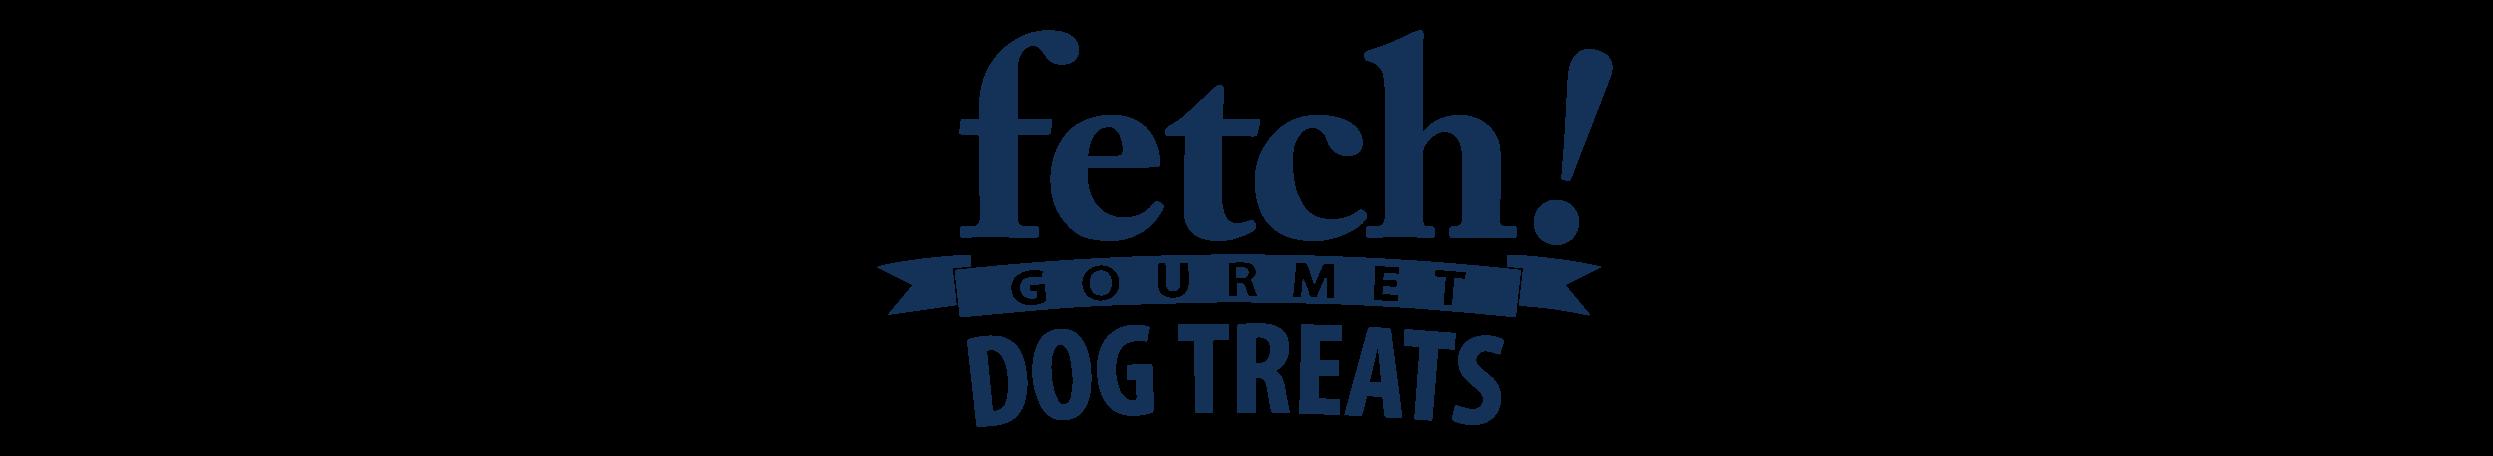 Fetch Dog Treats Testimonial.png